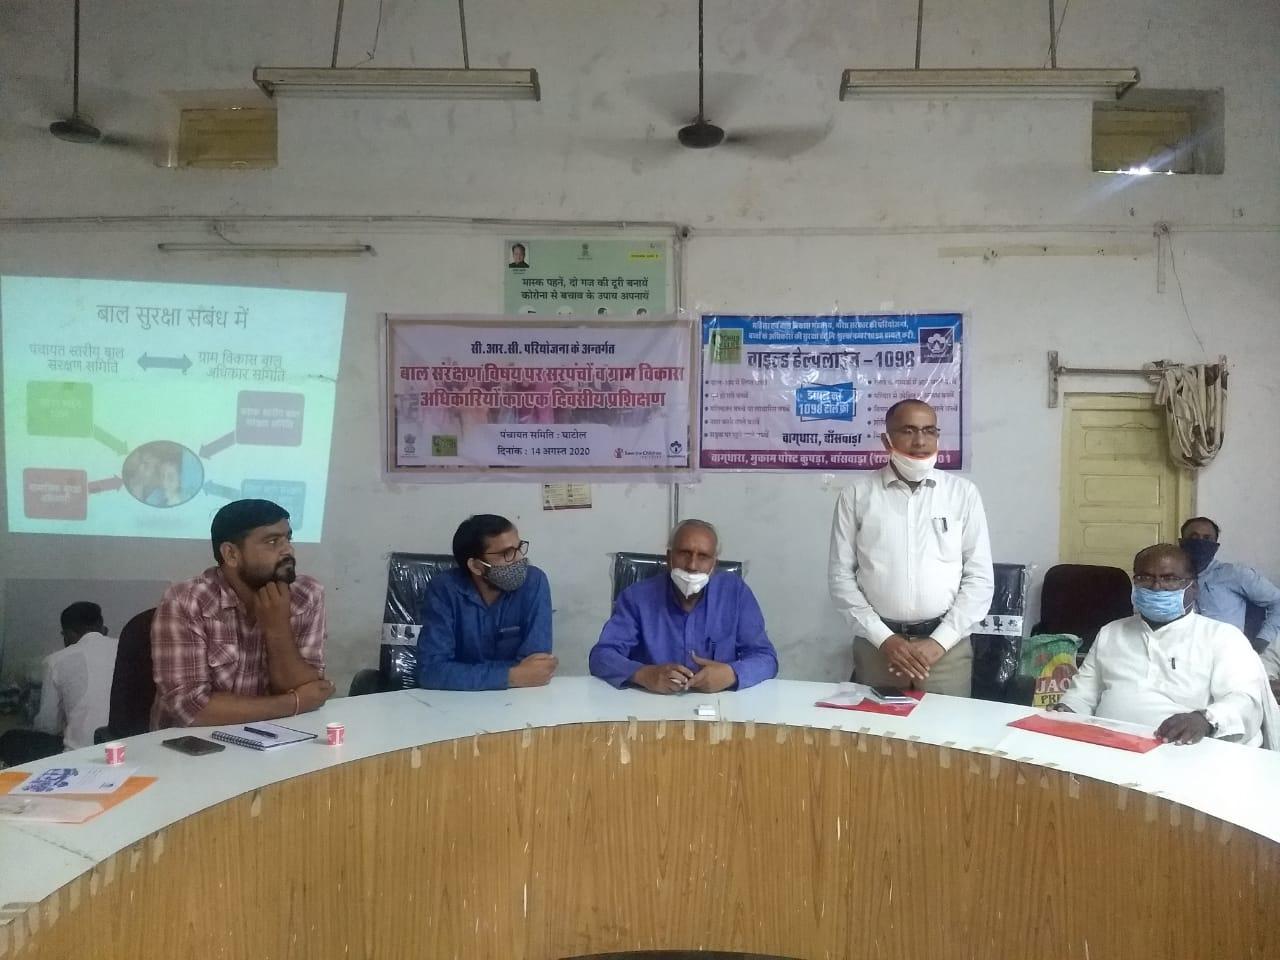 Sarpanch Orientation_Ghatol_Vaagdhara-Harikesh-Meena-Ghatol